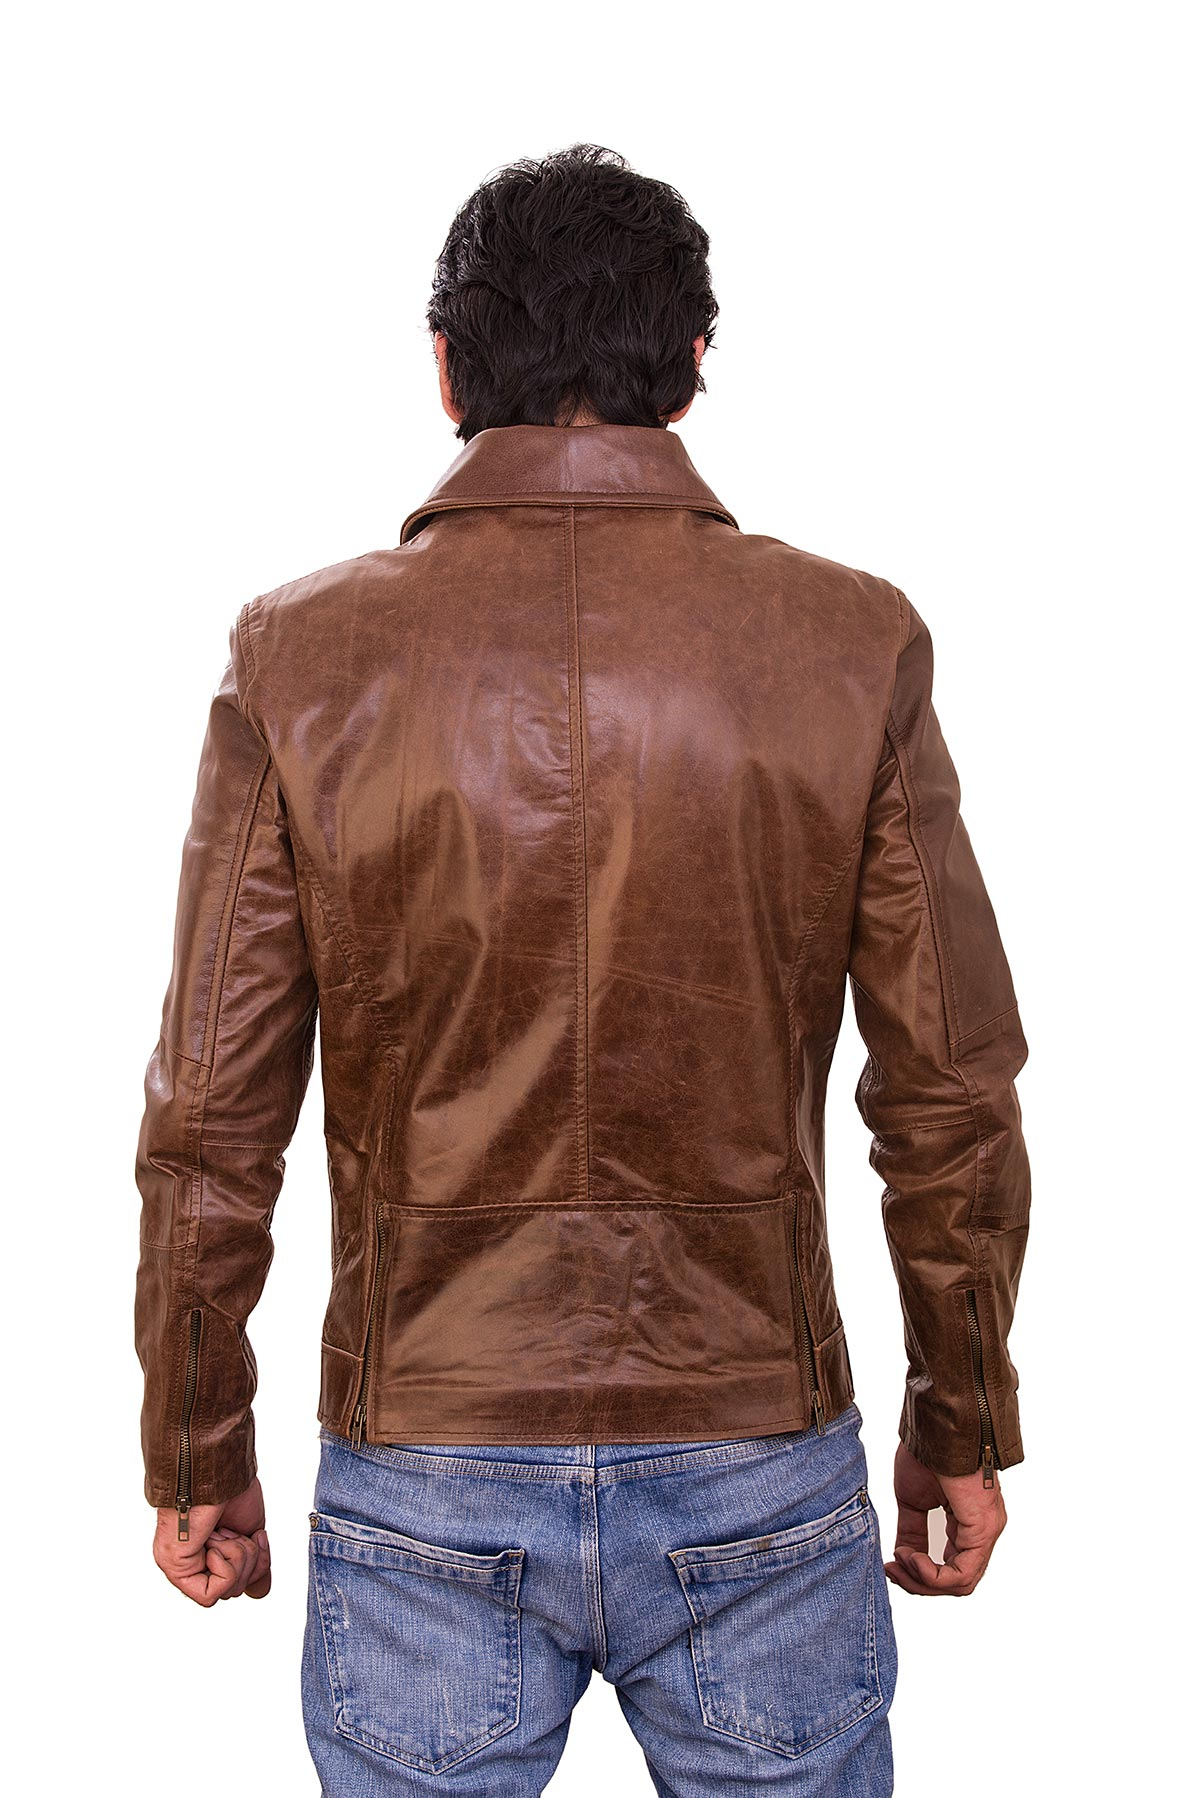 racing leather jacket vintage